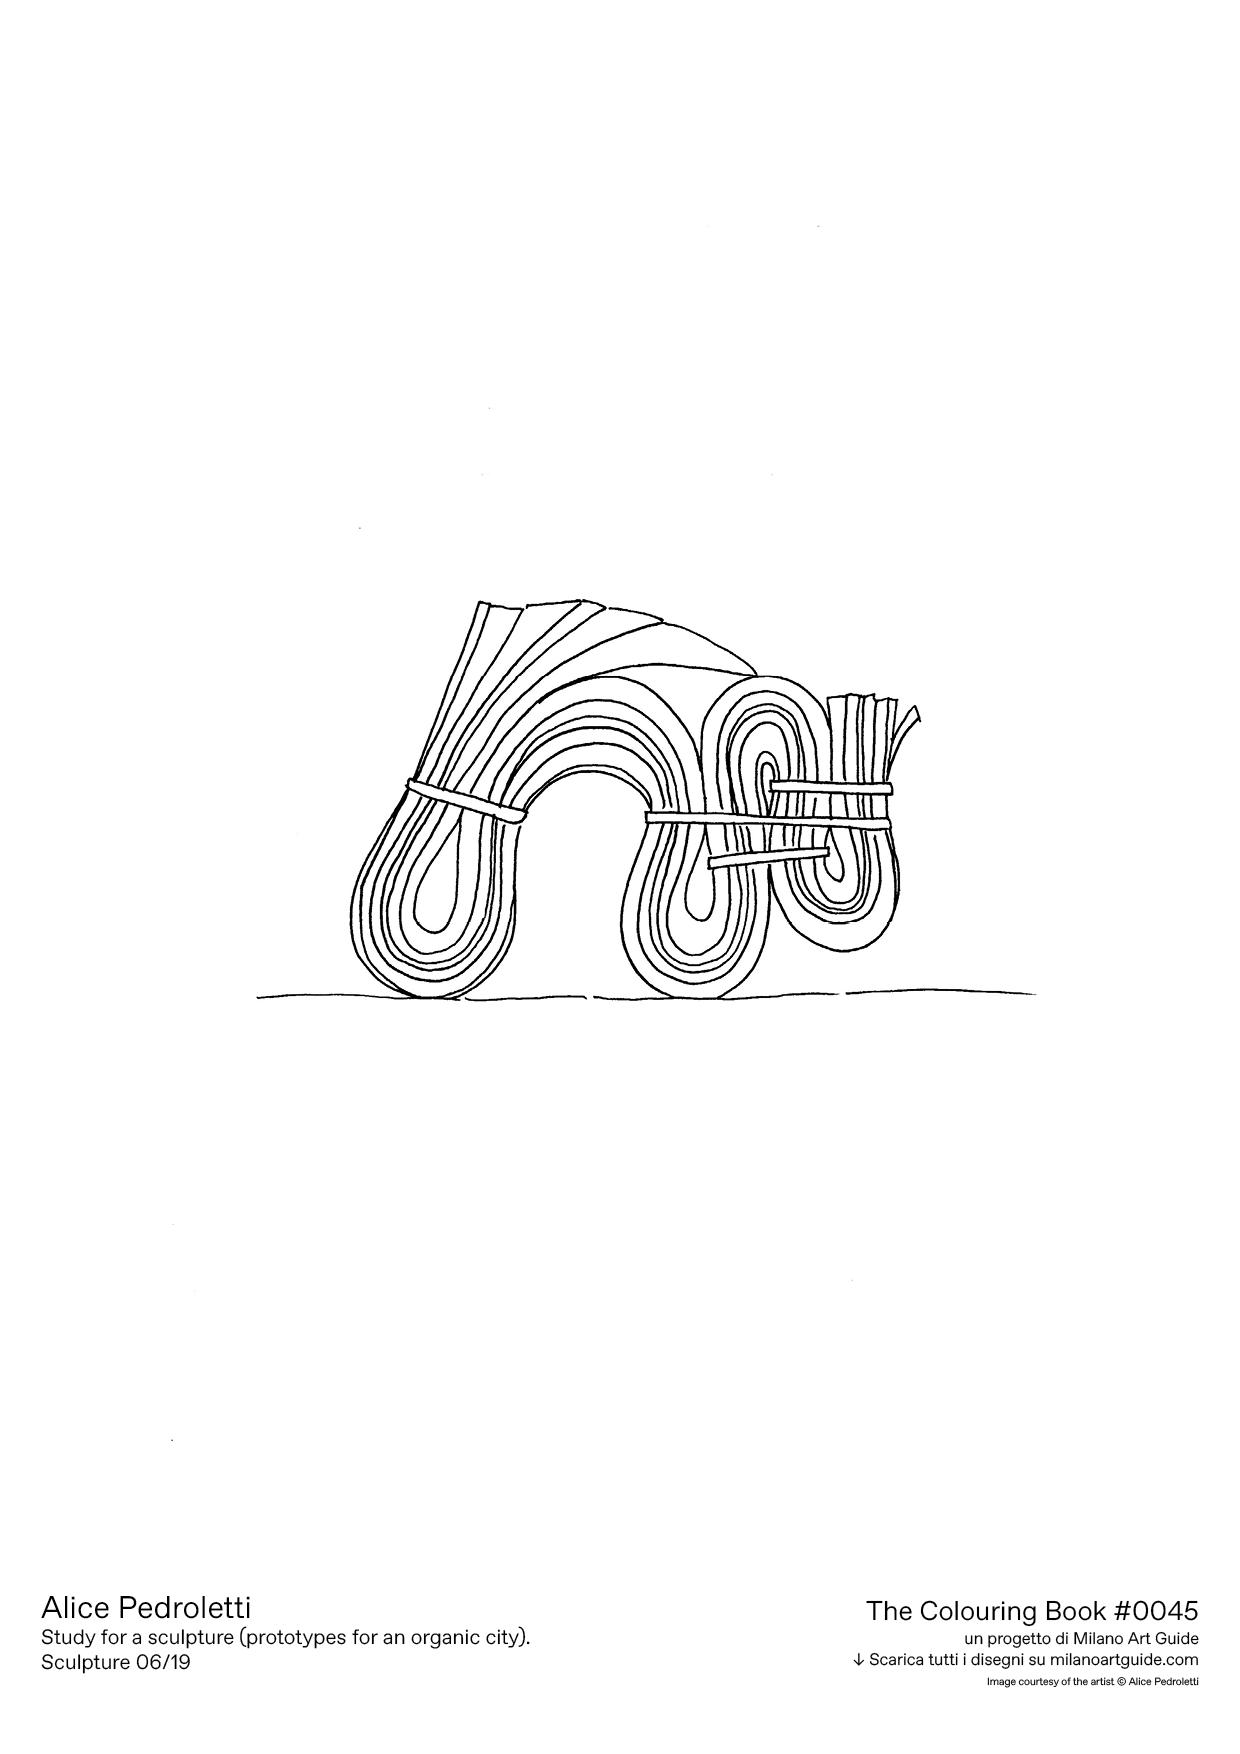 0045_AlicePedroletti_StudyforaSculpture_THECOLOURINGBOOK_MILANOARTGUIDE.png